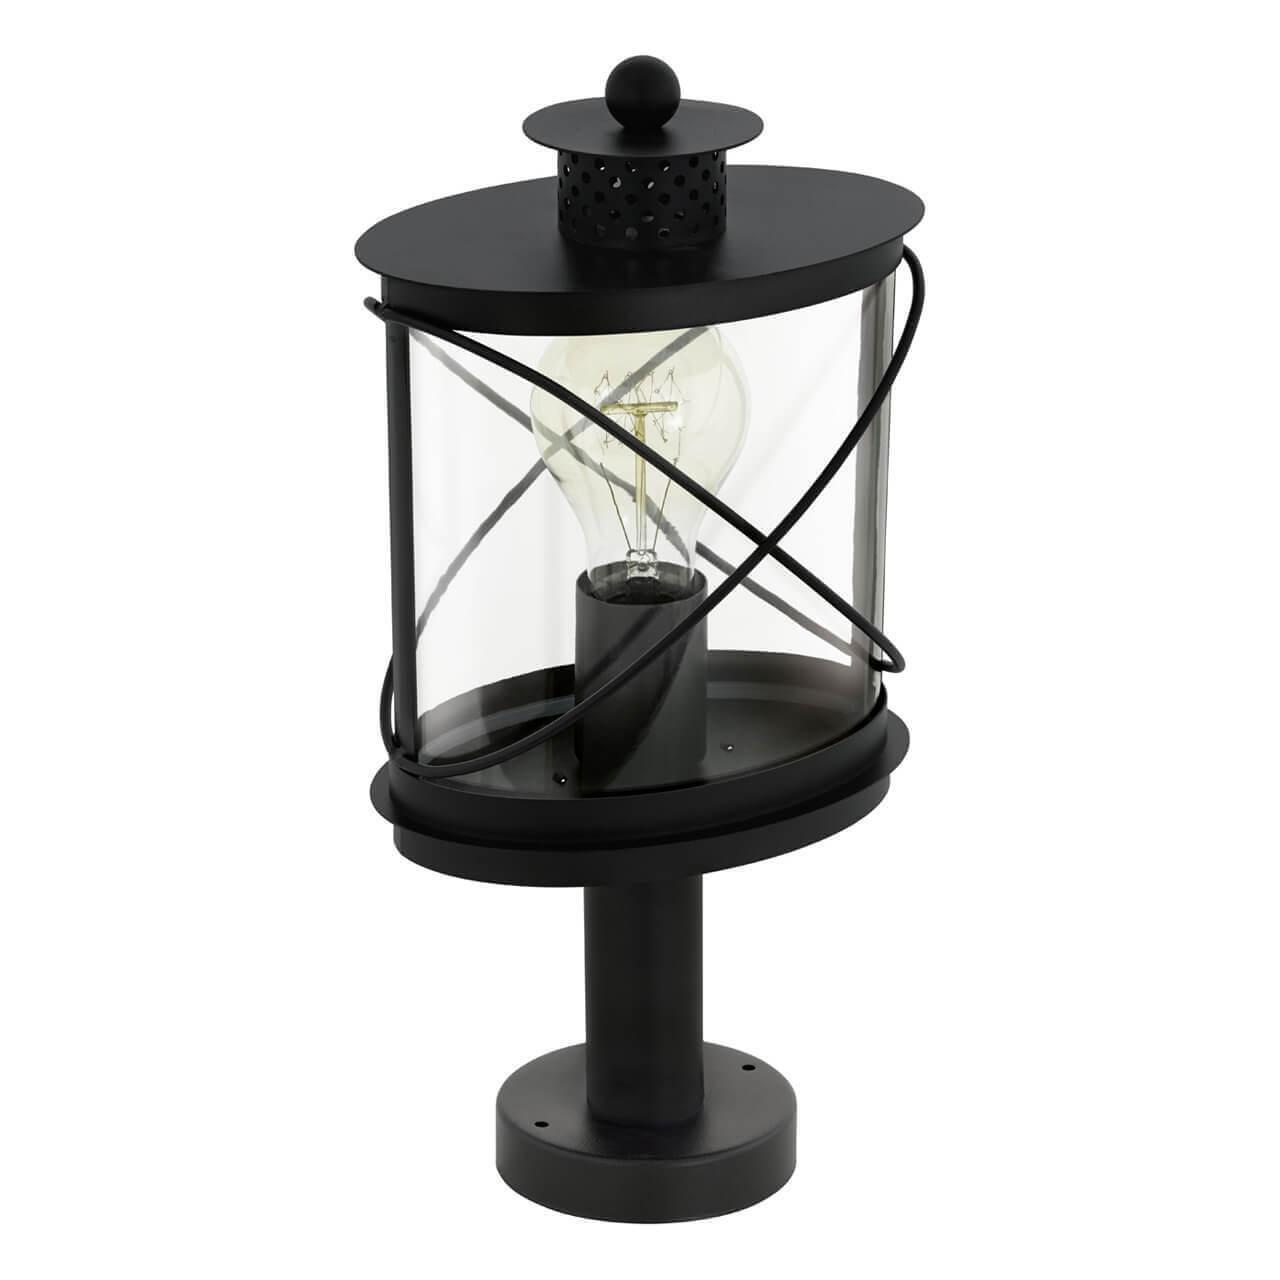 Светильник Eglo 94864 Hilburn eglo светильник уличный hilburn 94843